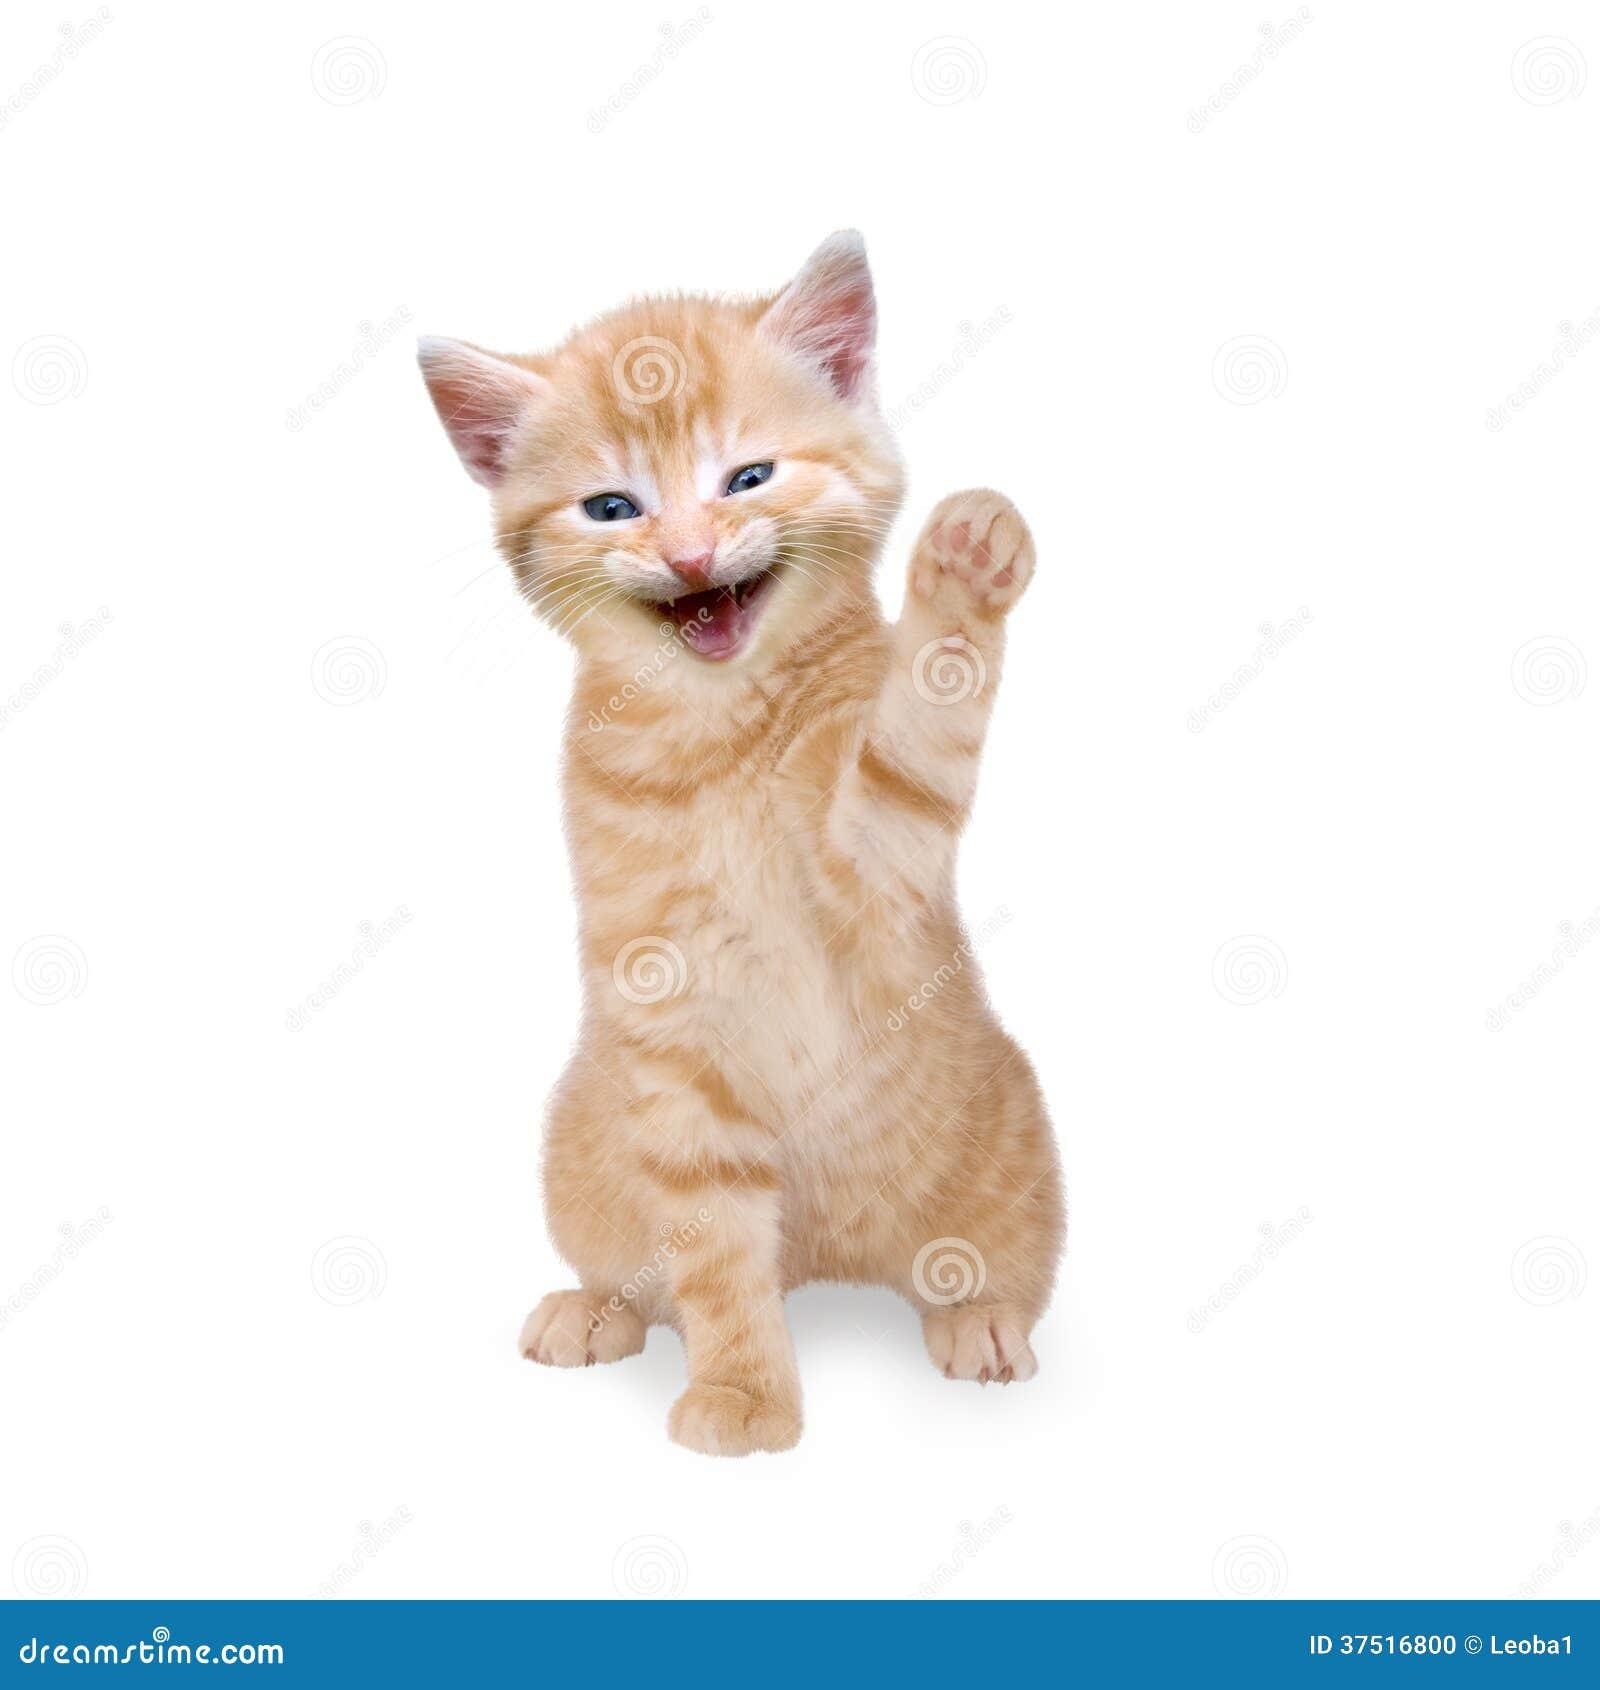 Cat Waving Goodbye Animation